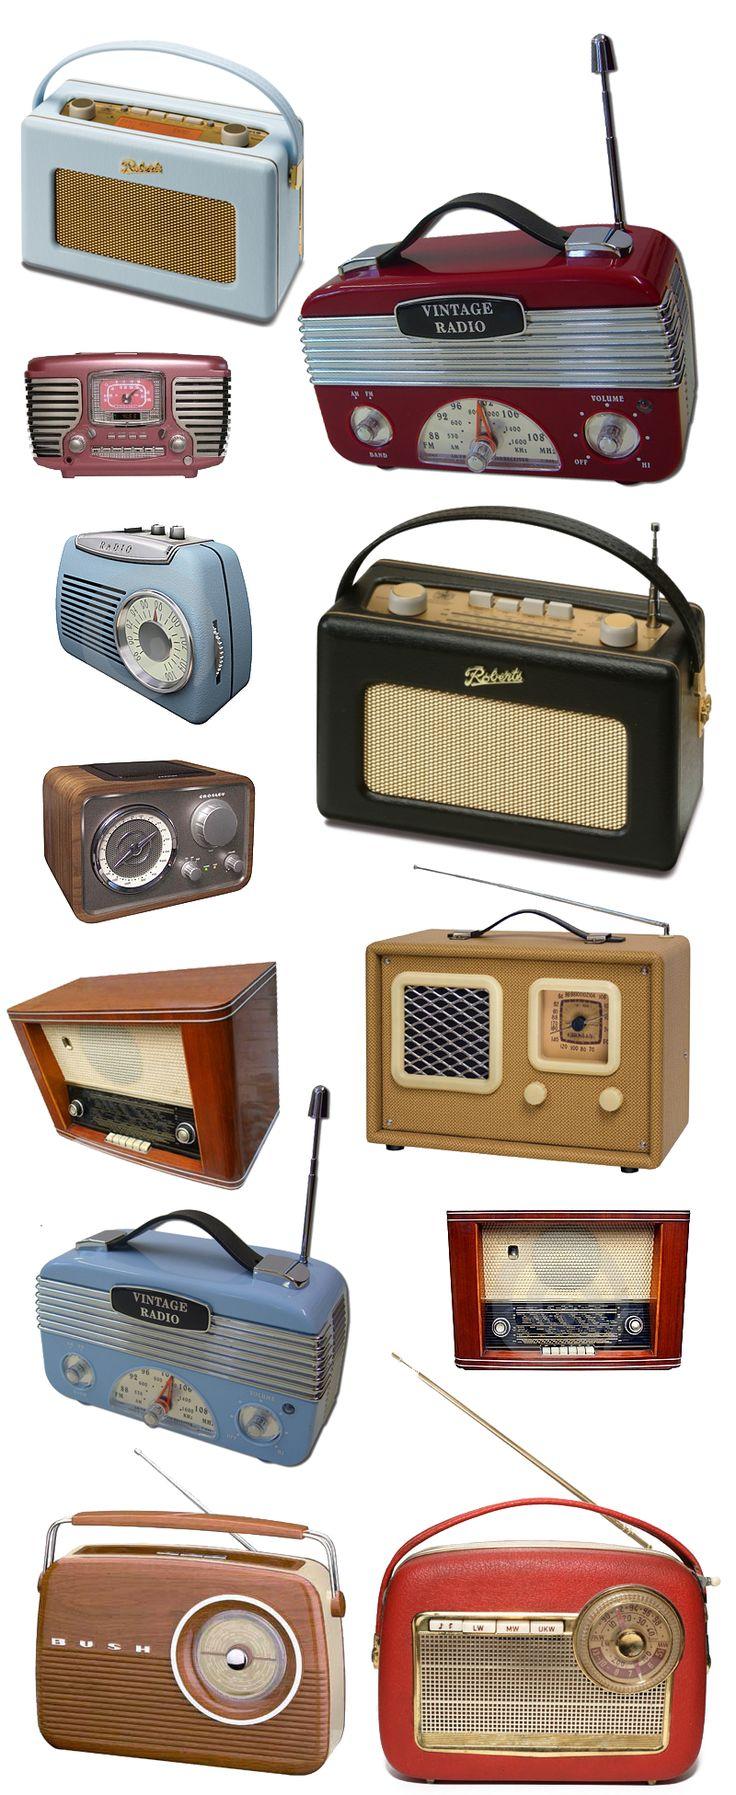 Retro radio by ~simplyuse on deviantART